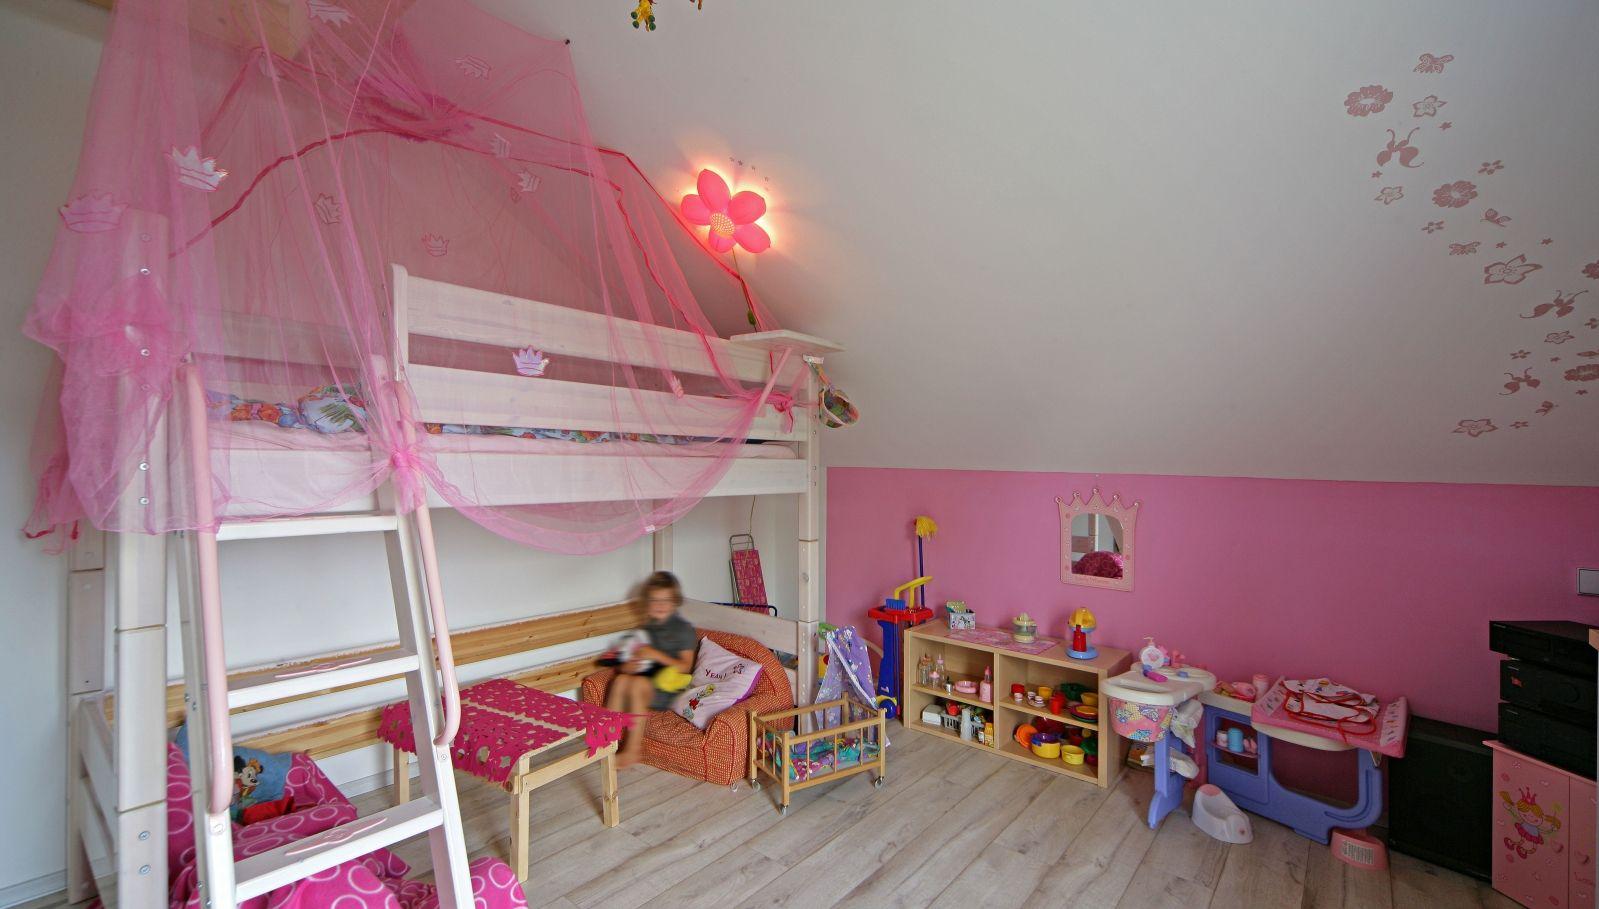 Kinderzimmer Prinzessin Kinderzimmer, Kinder zimmer